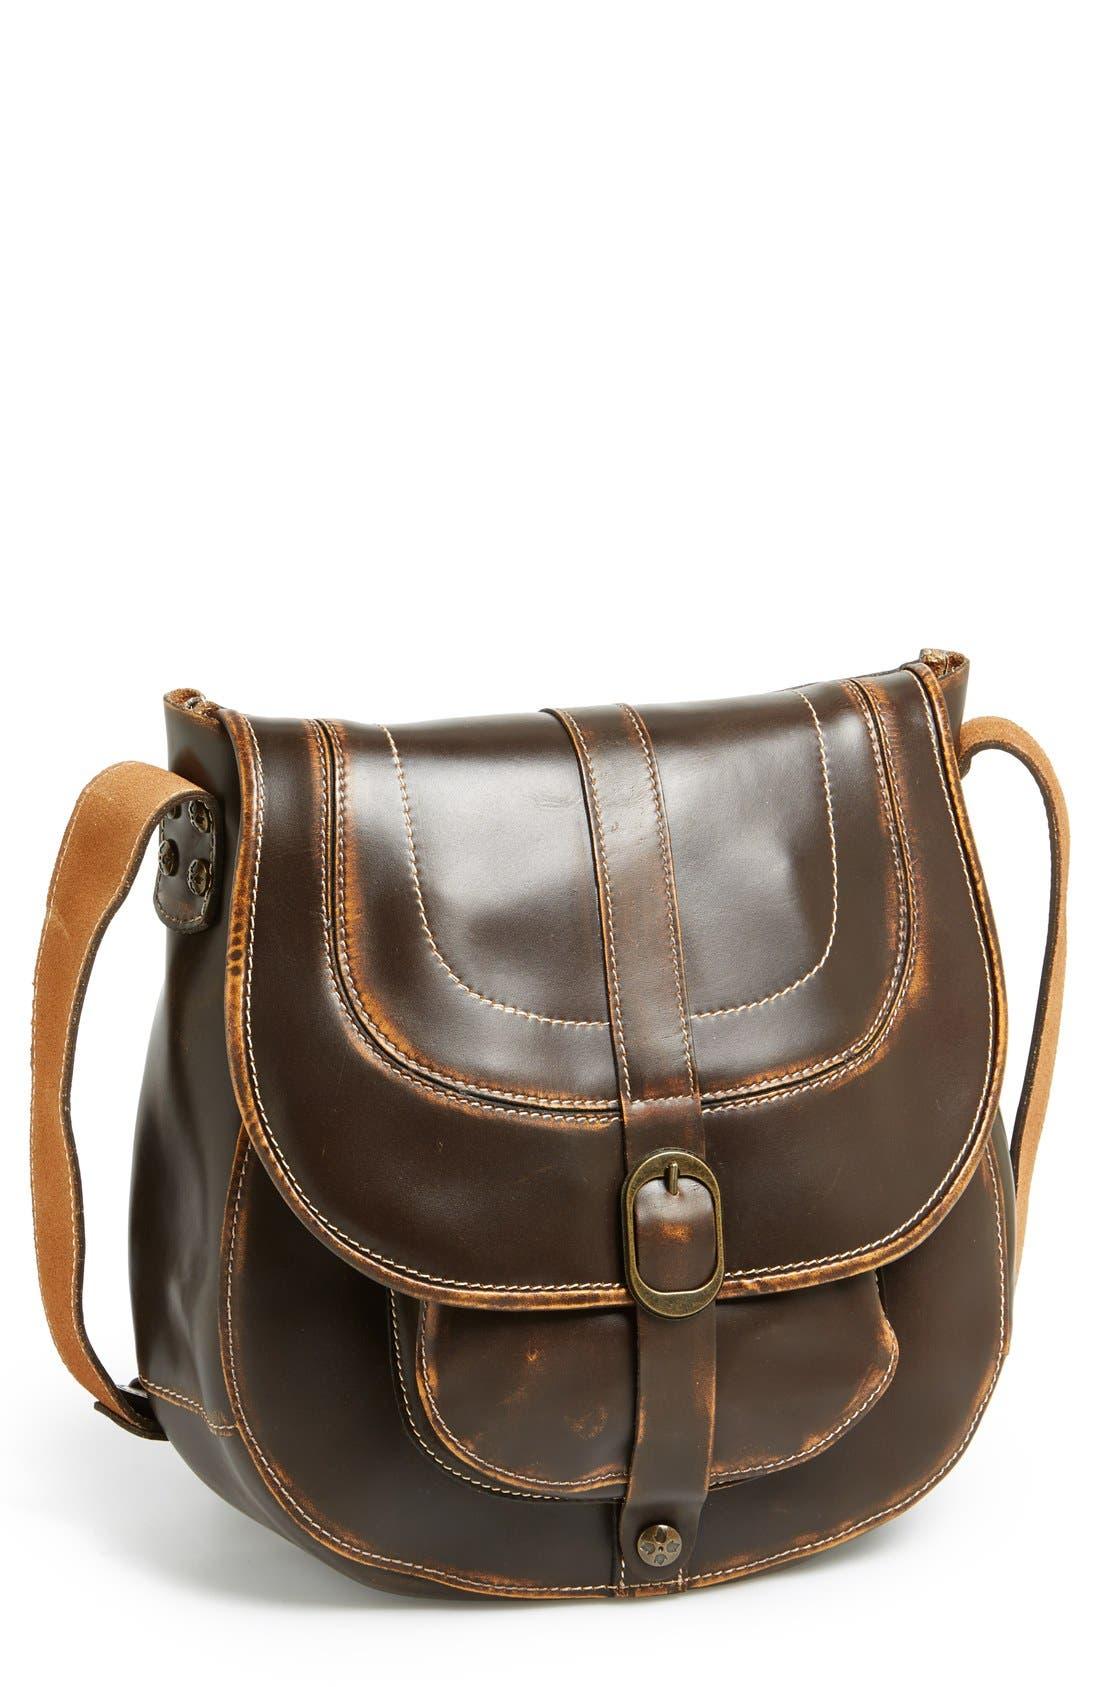 Main Image - Patricia Nash 'Barcellona' Leather Crossbody Bag